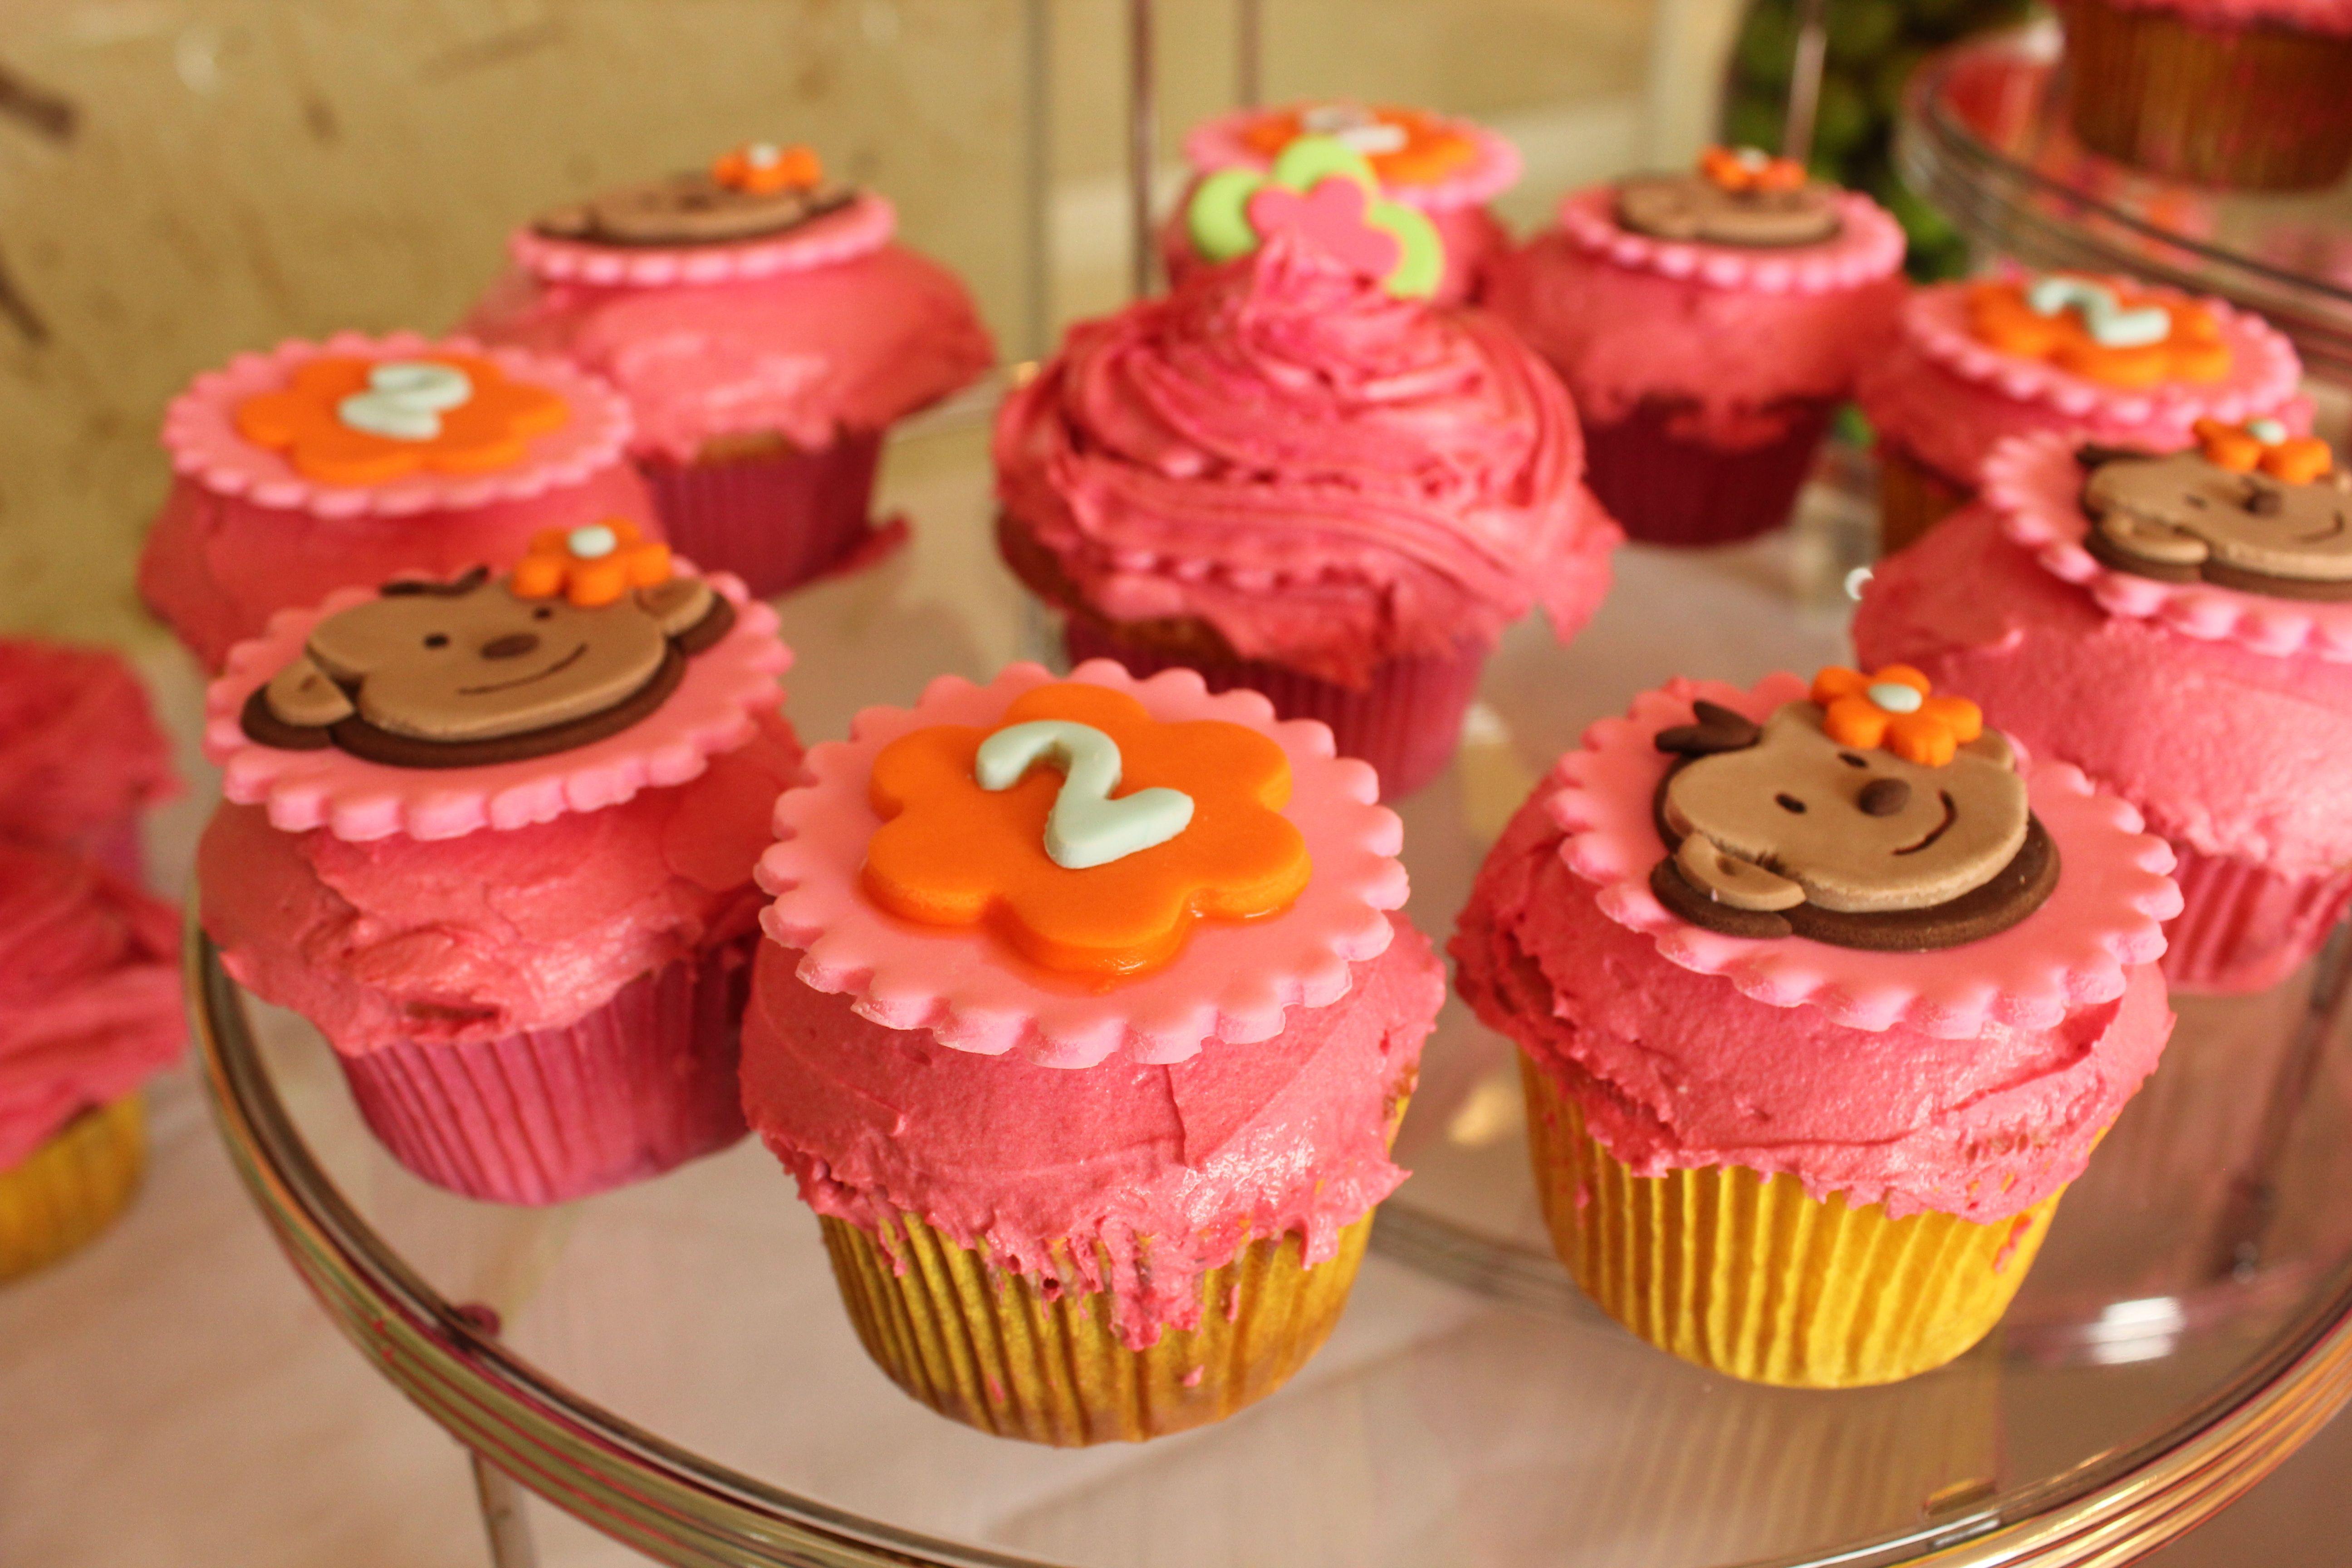 Monkey love cupcakes - photo#5